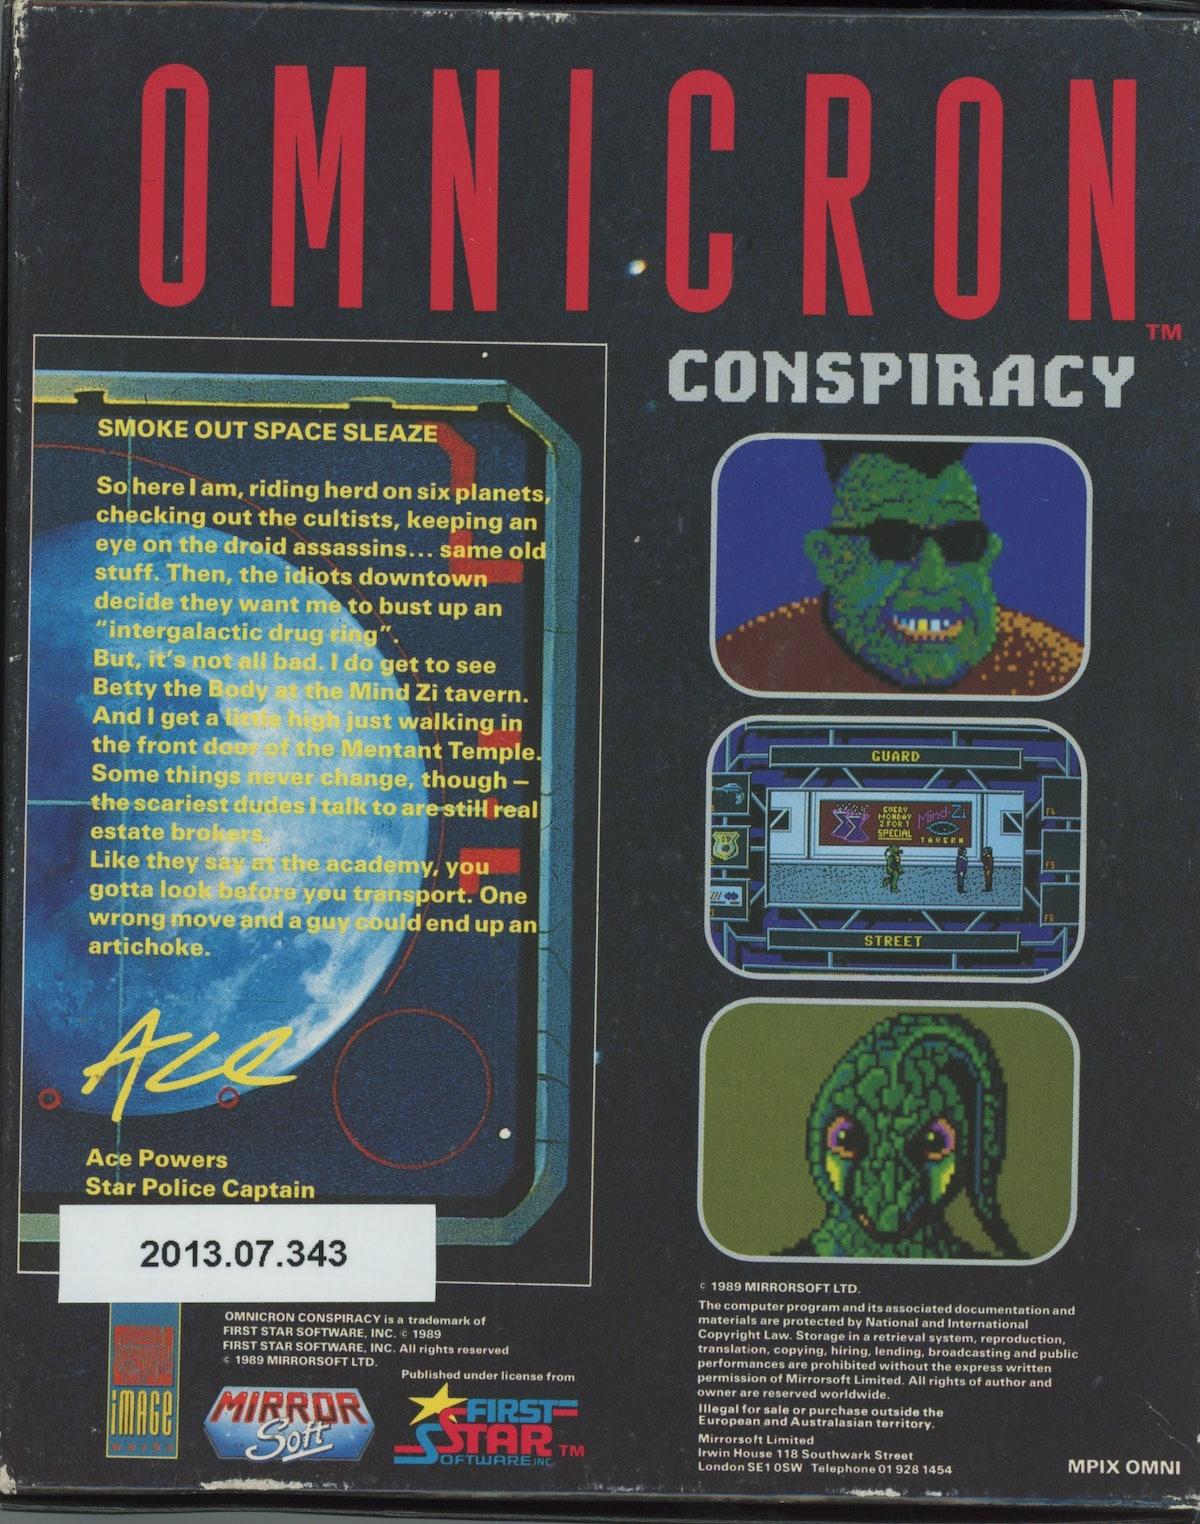 Omnicron Conspiracy